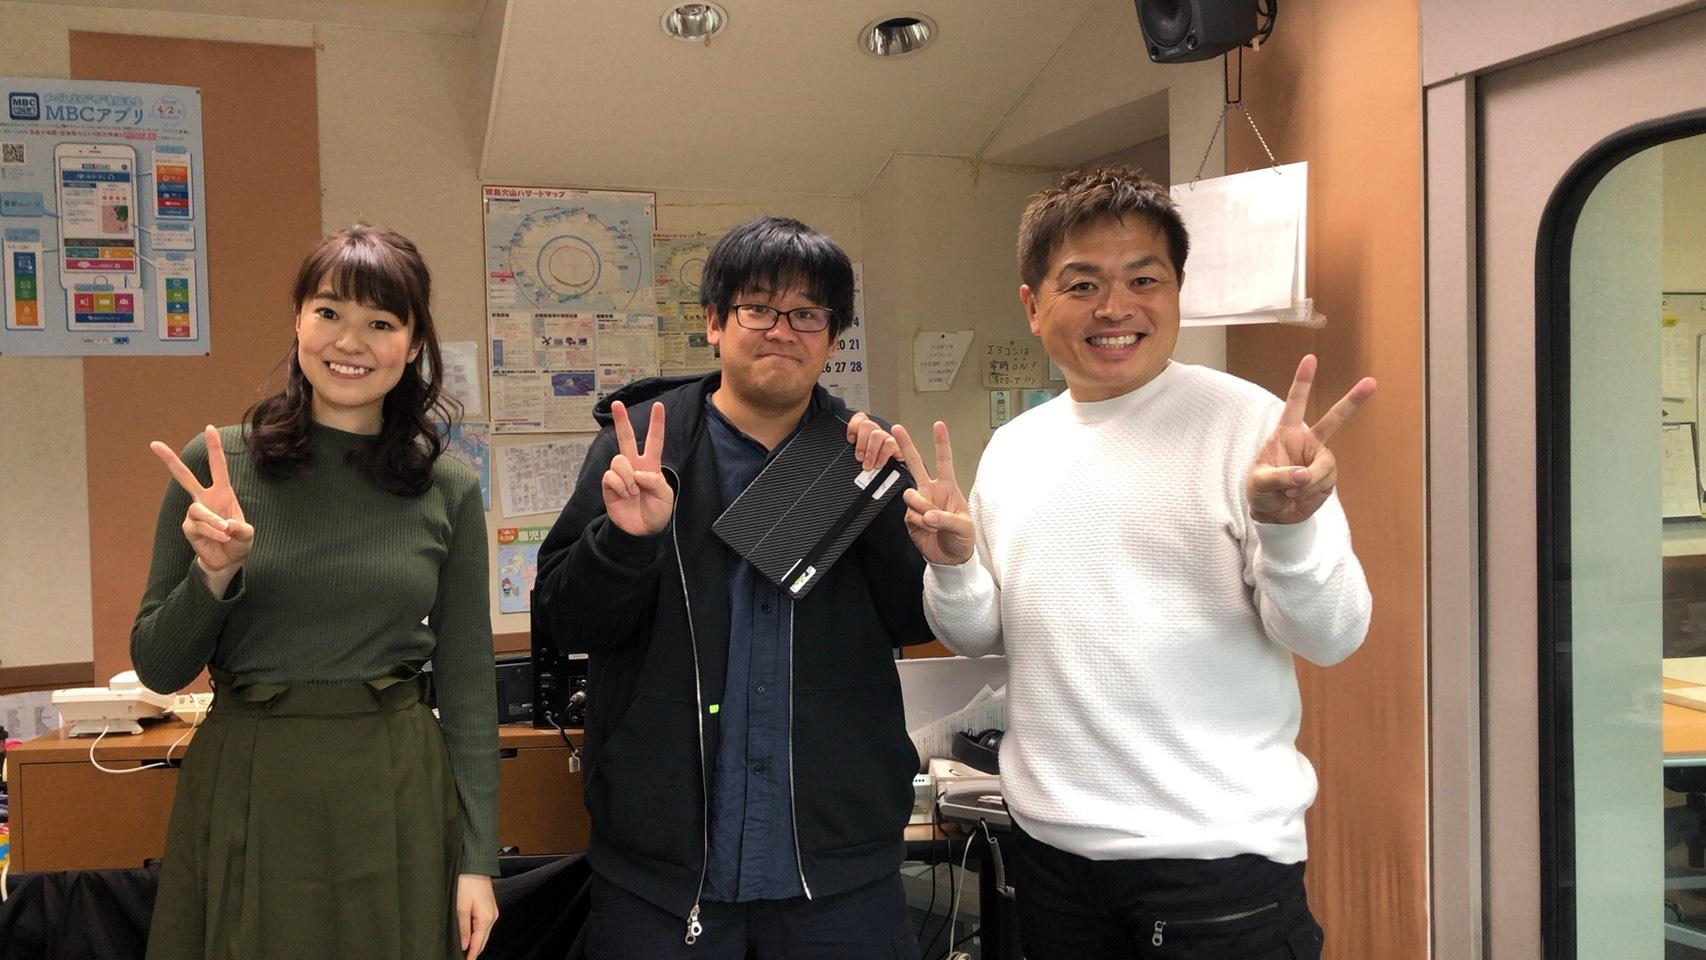 【MBCバズかご】KagoshimaniaX的、勝手に鹿児島で頑張ったで賞2019!【2019.12.21】